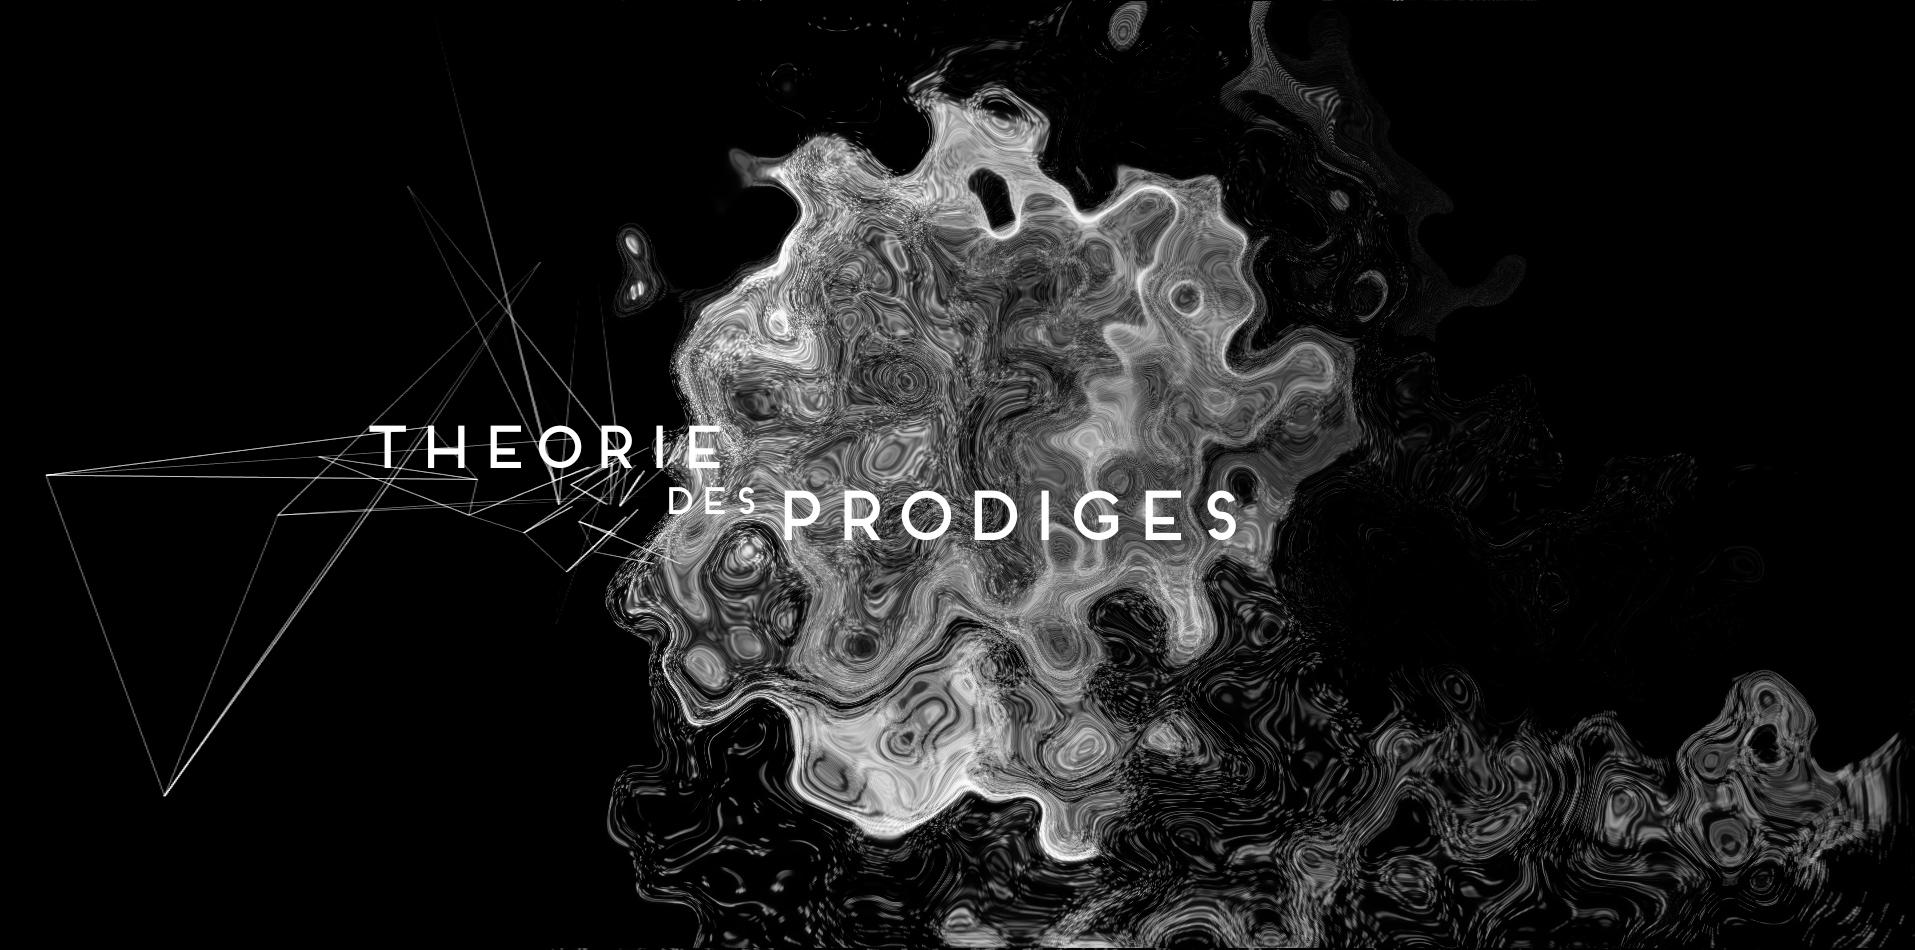 theorie-des-prodiges-2